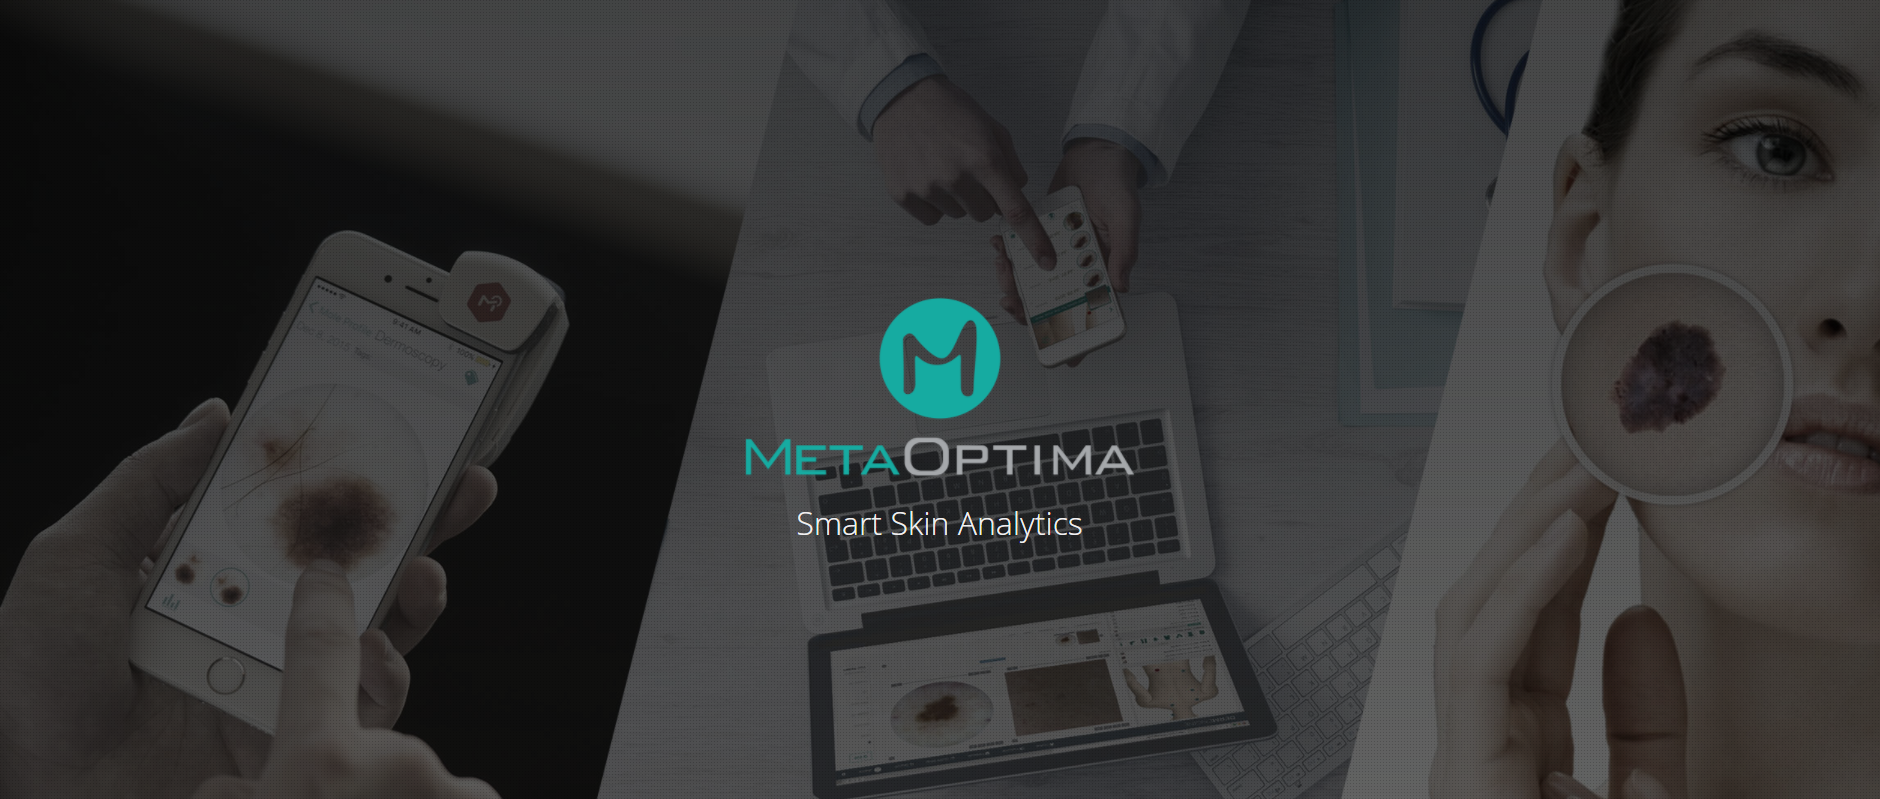 metaoptima home page.png